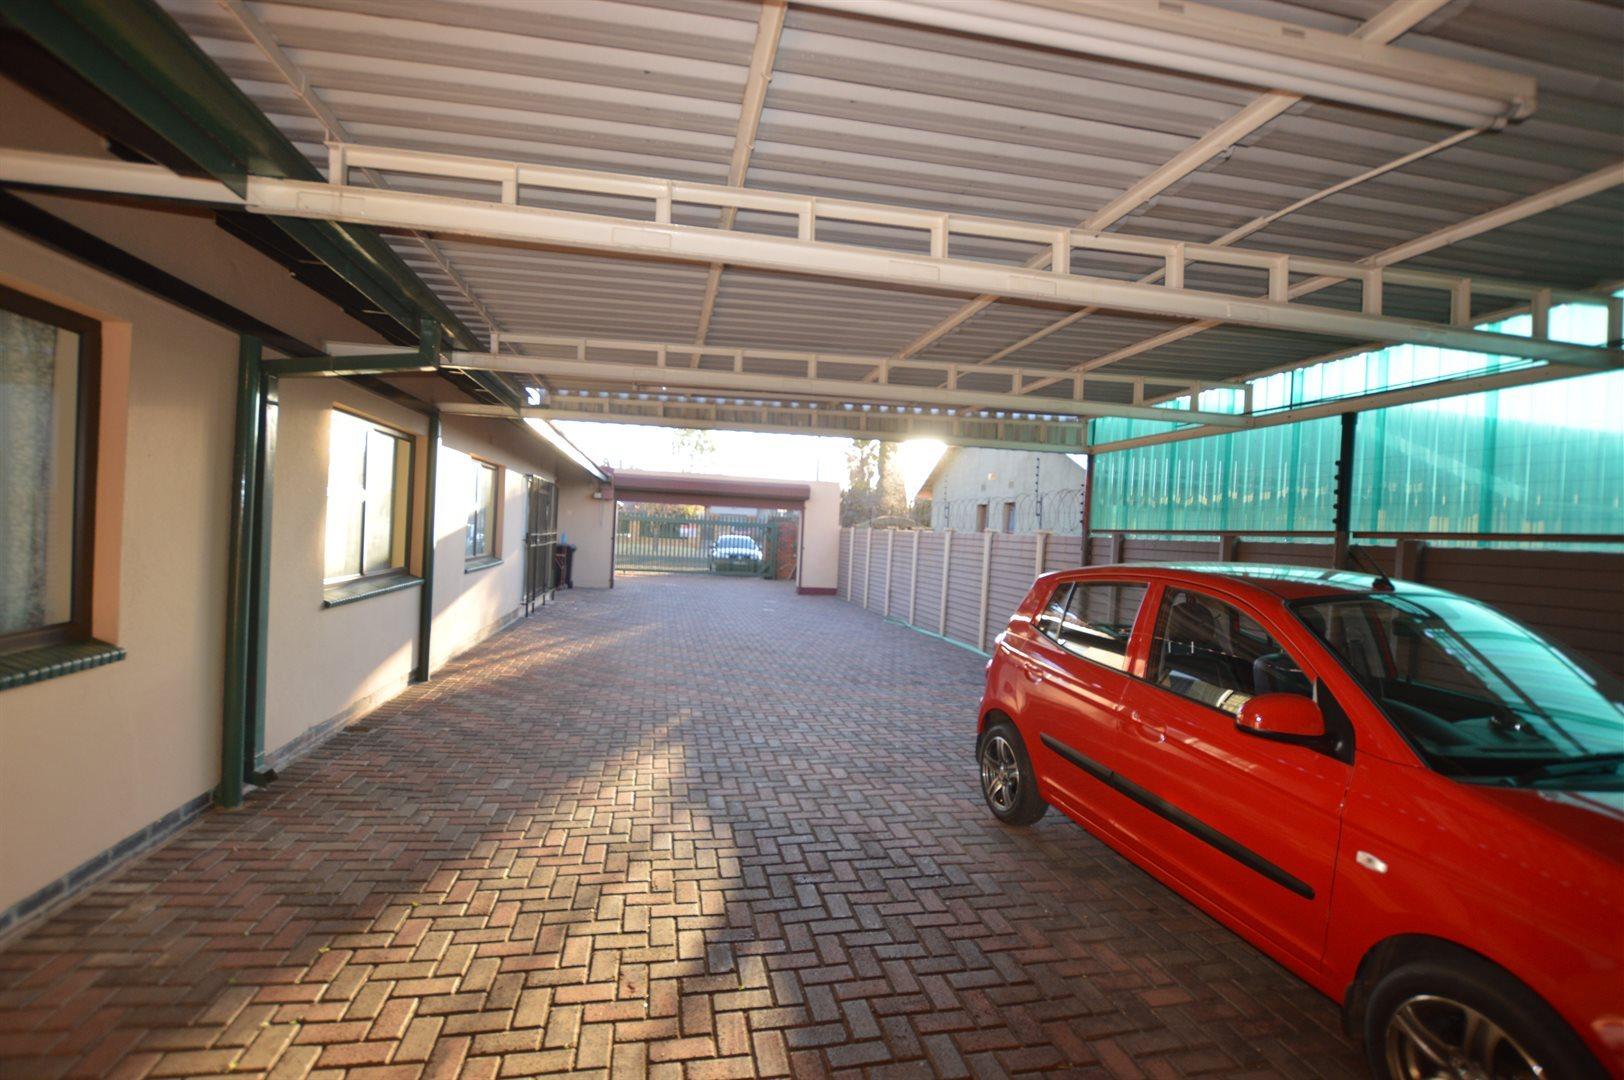 Vanderbijlpark Se6 property for sale. Ref No: 13523020. Picture no 19